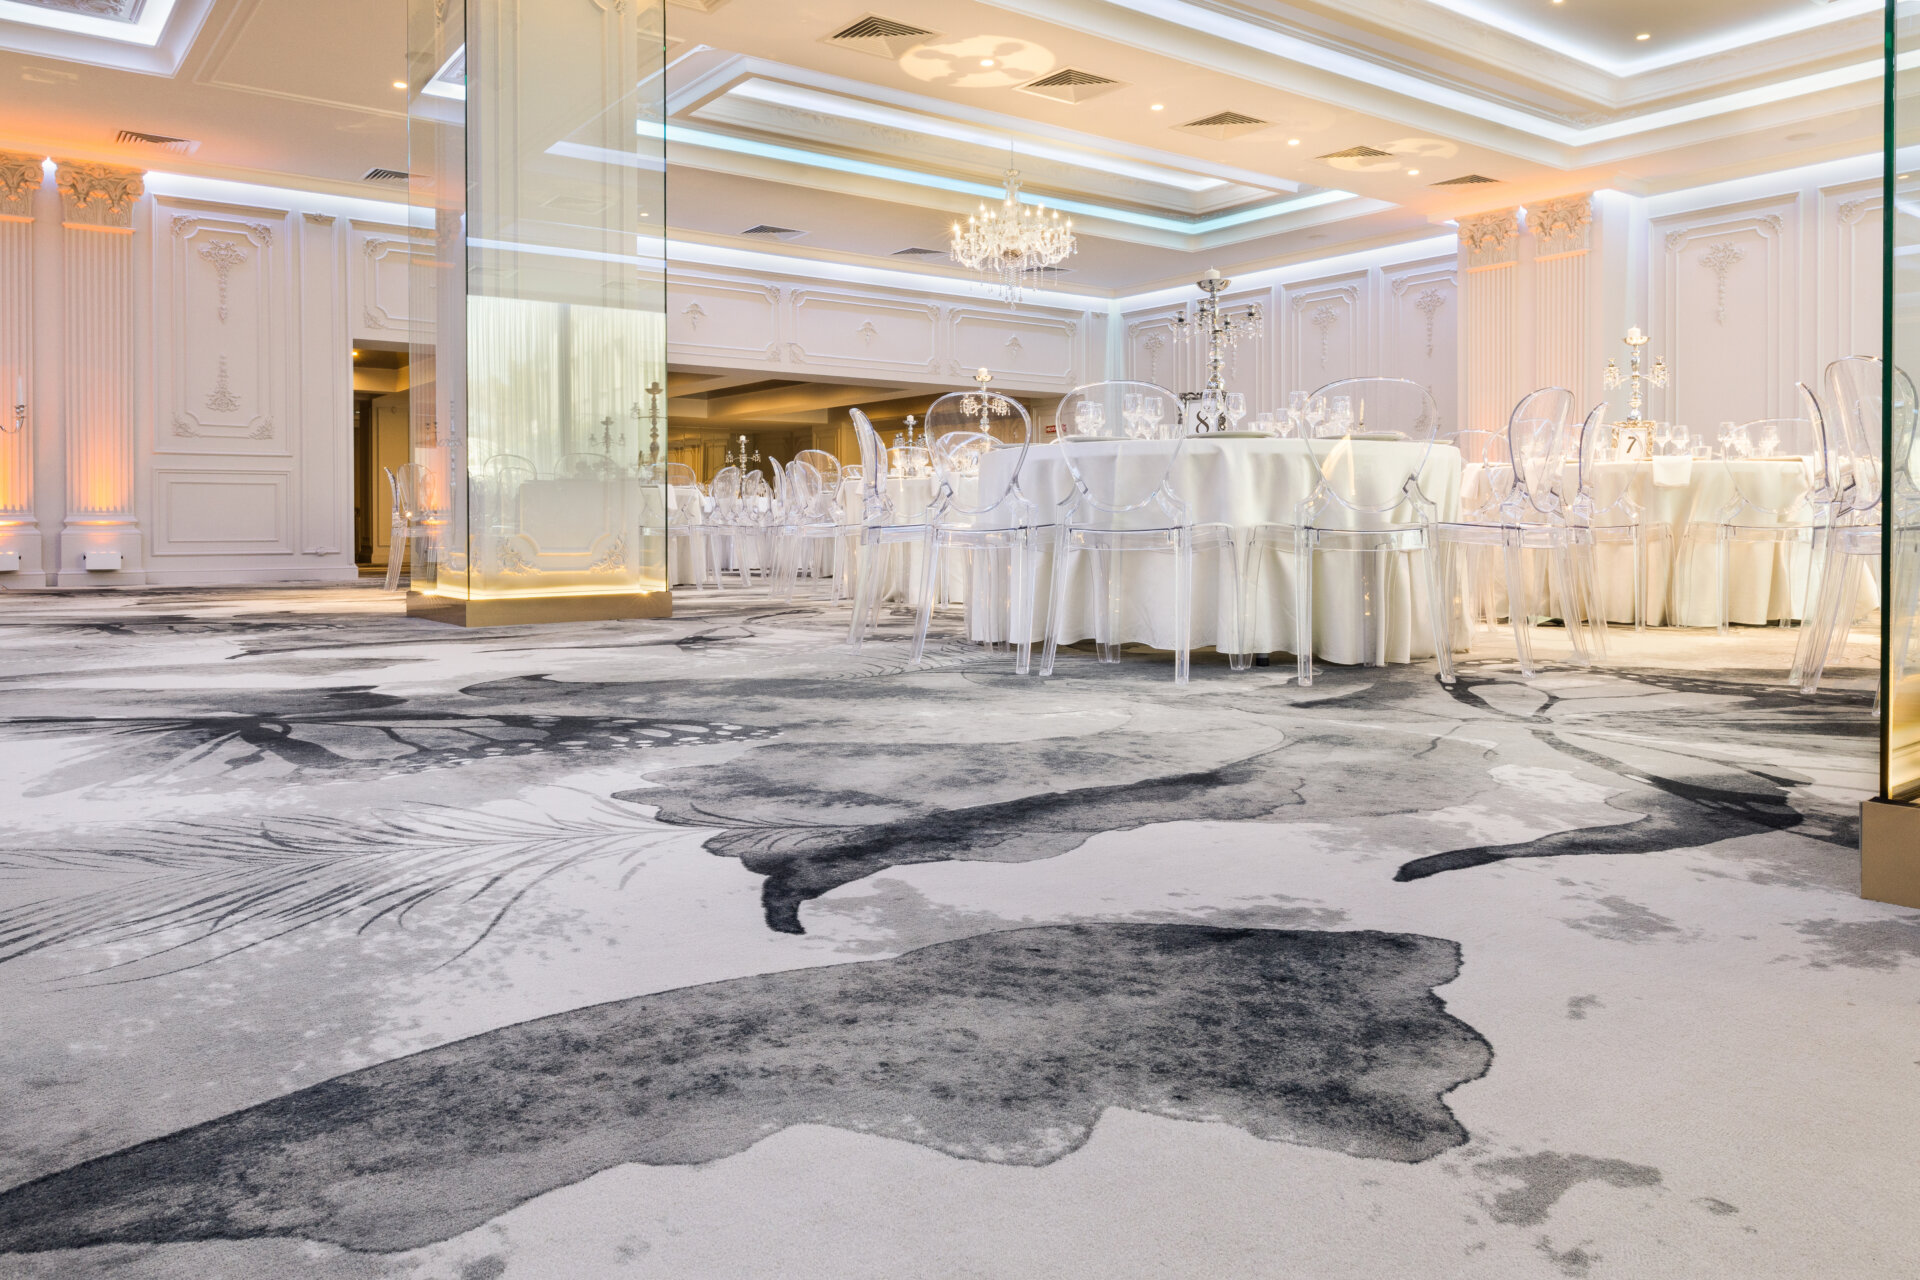 20210303-carpet&more-hotel-rocca-craiovaby-hugmedia-17